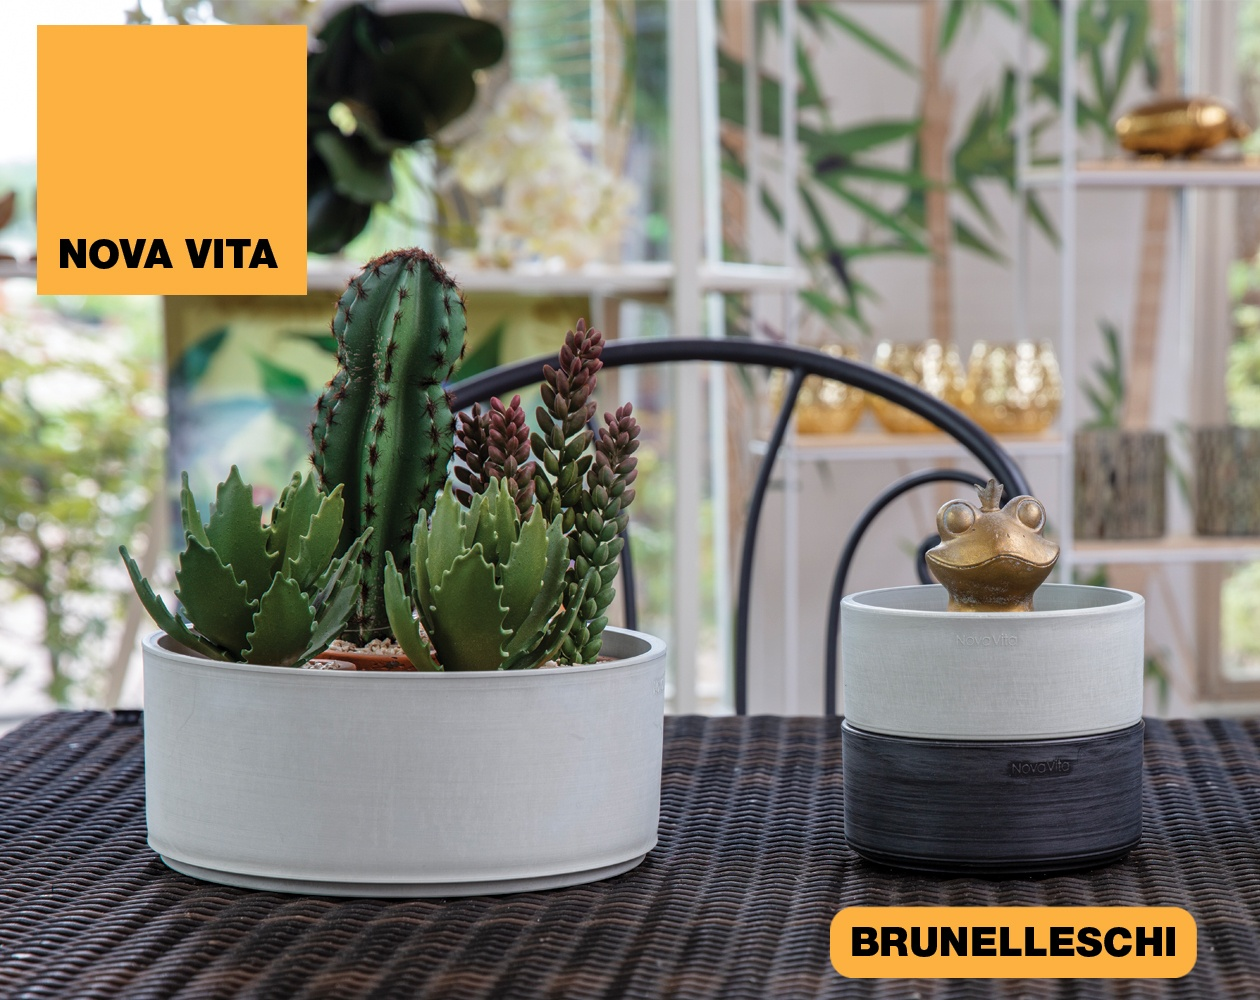 Brunelleschi Vasi in plastica riciclata linea Nova Vita Art Plast